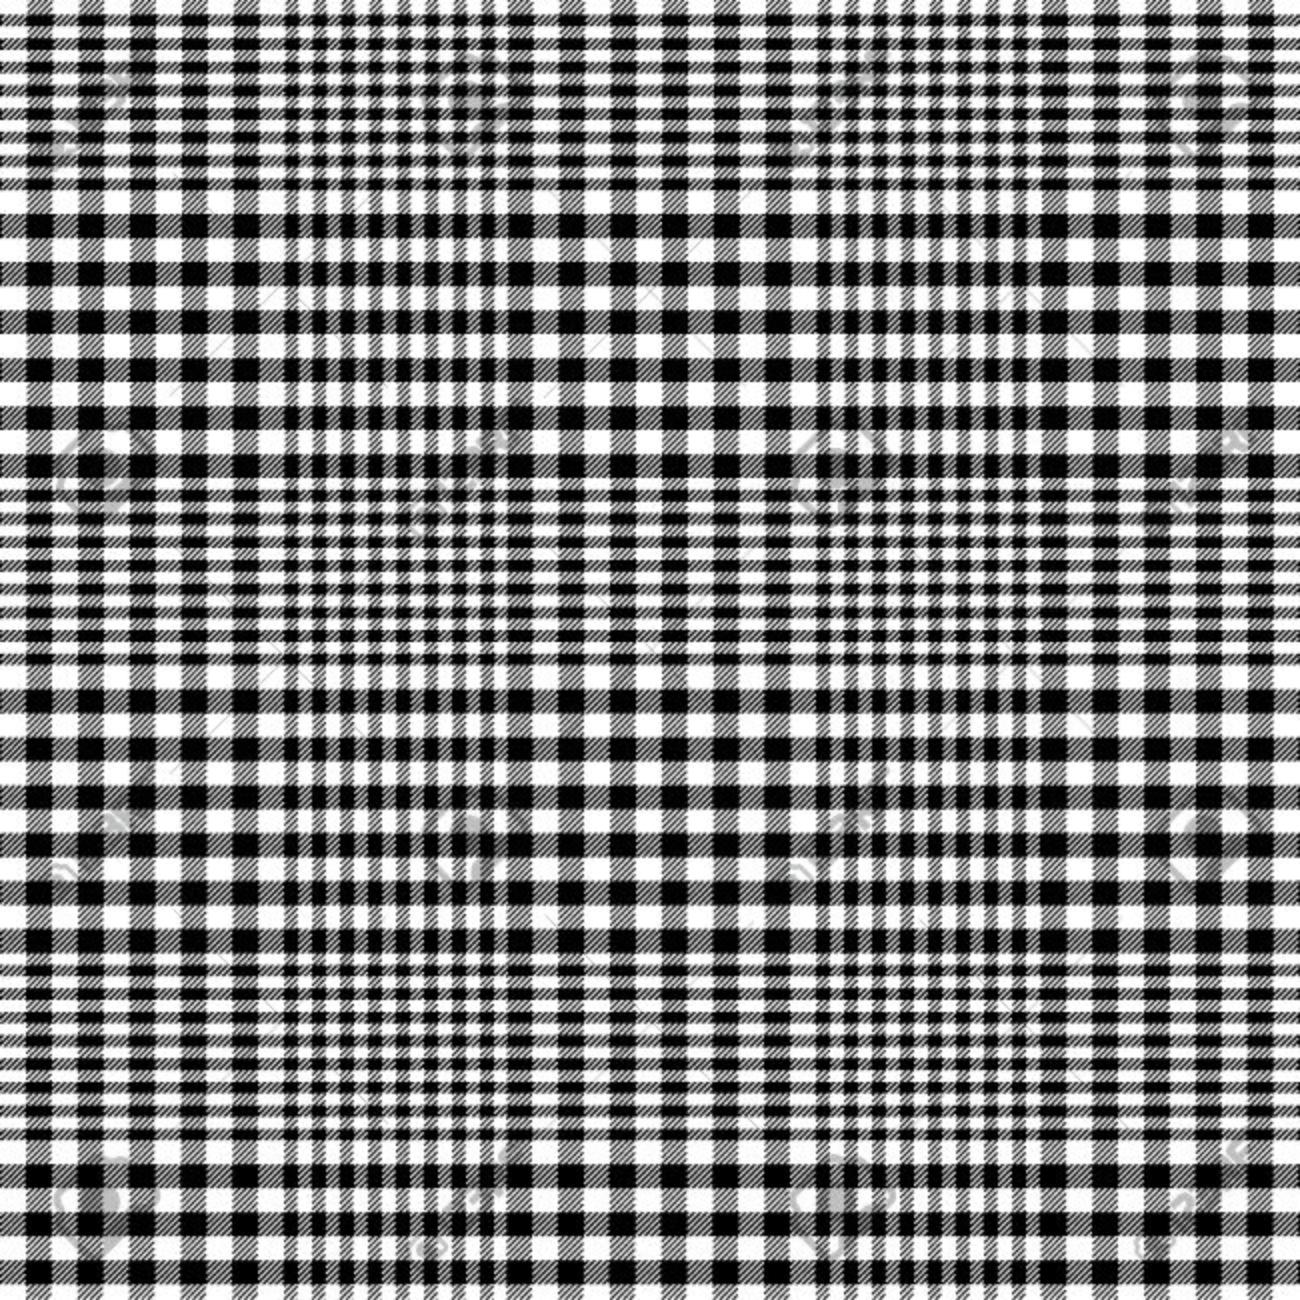 black and white glen plaid pattern - 35816472